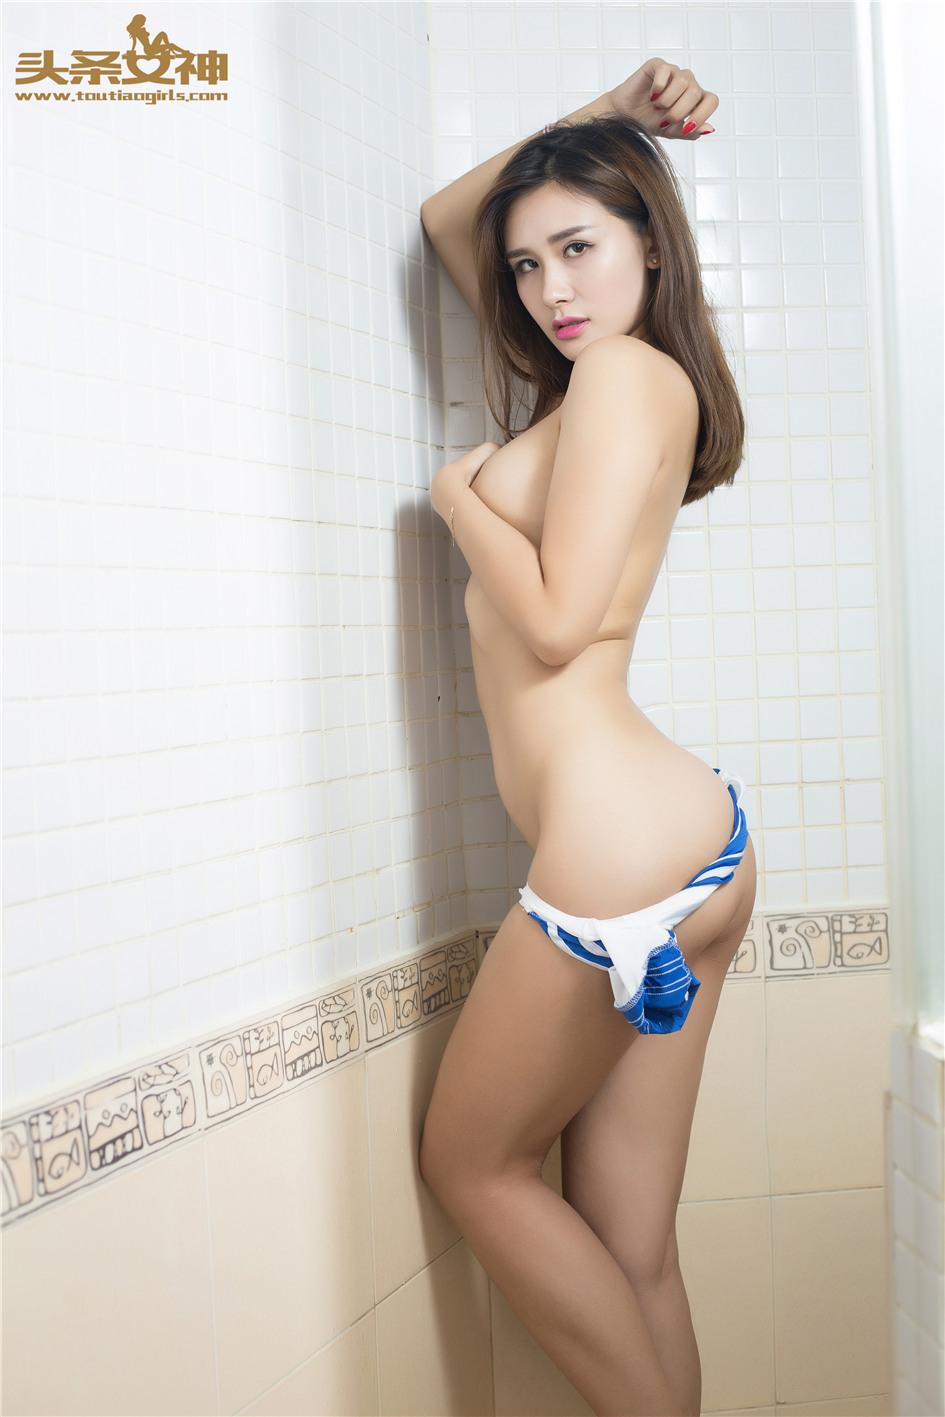 [TouTiao头条女神] 2016.08.17 No.099 浴室极致露出 斯童 - Model Magz